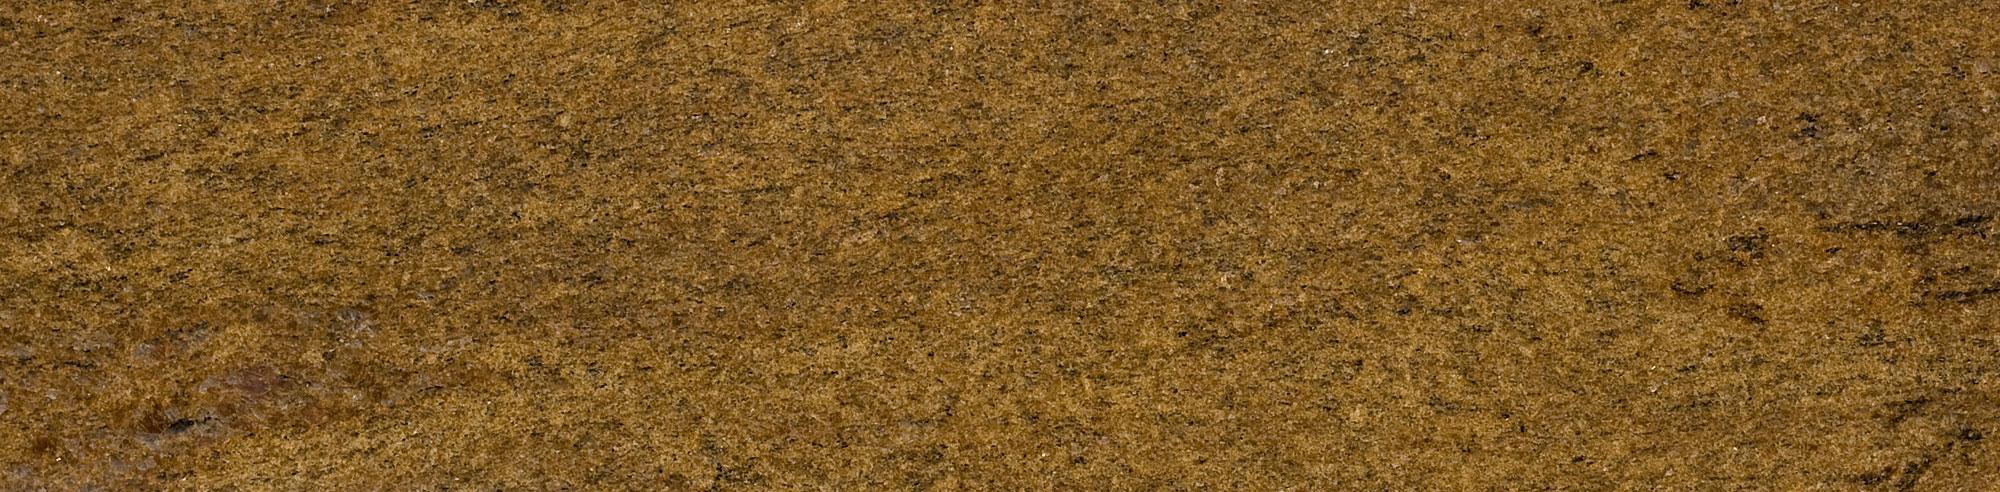 Granit Giallo Arena Imperialea